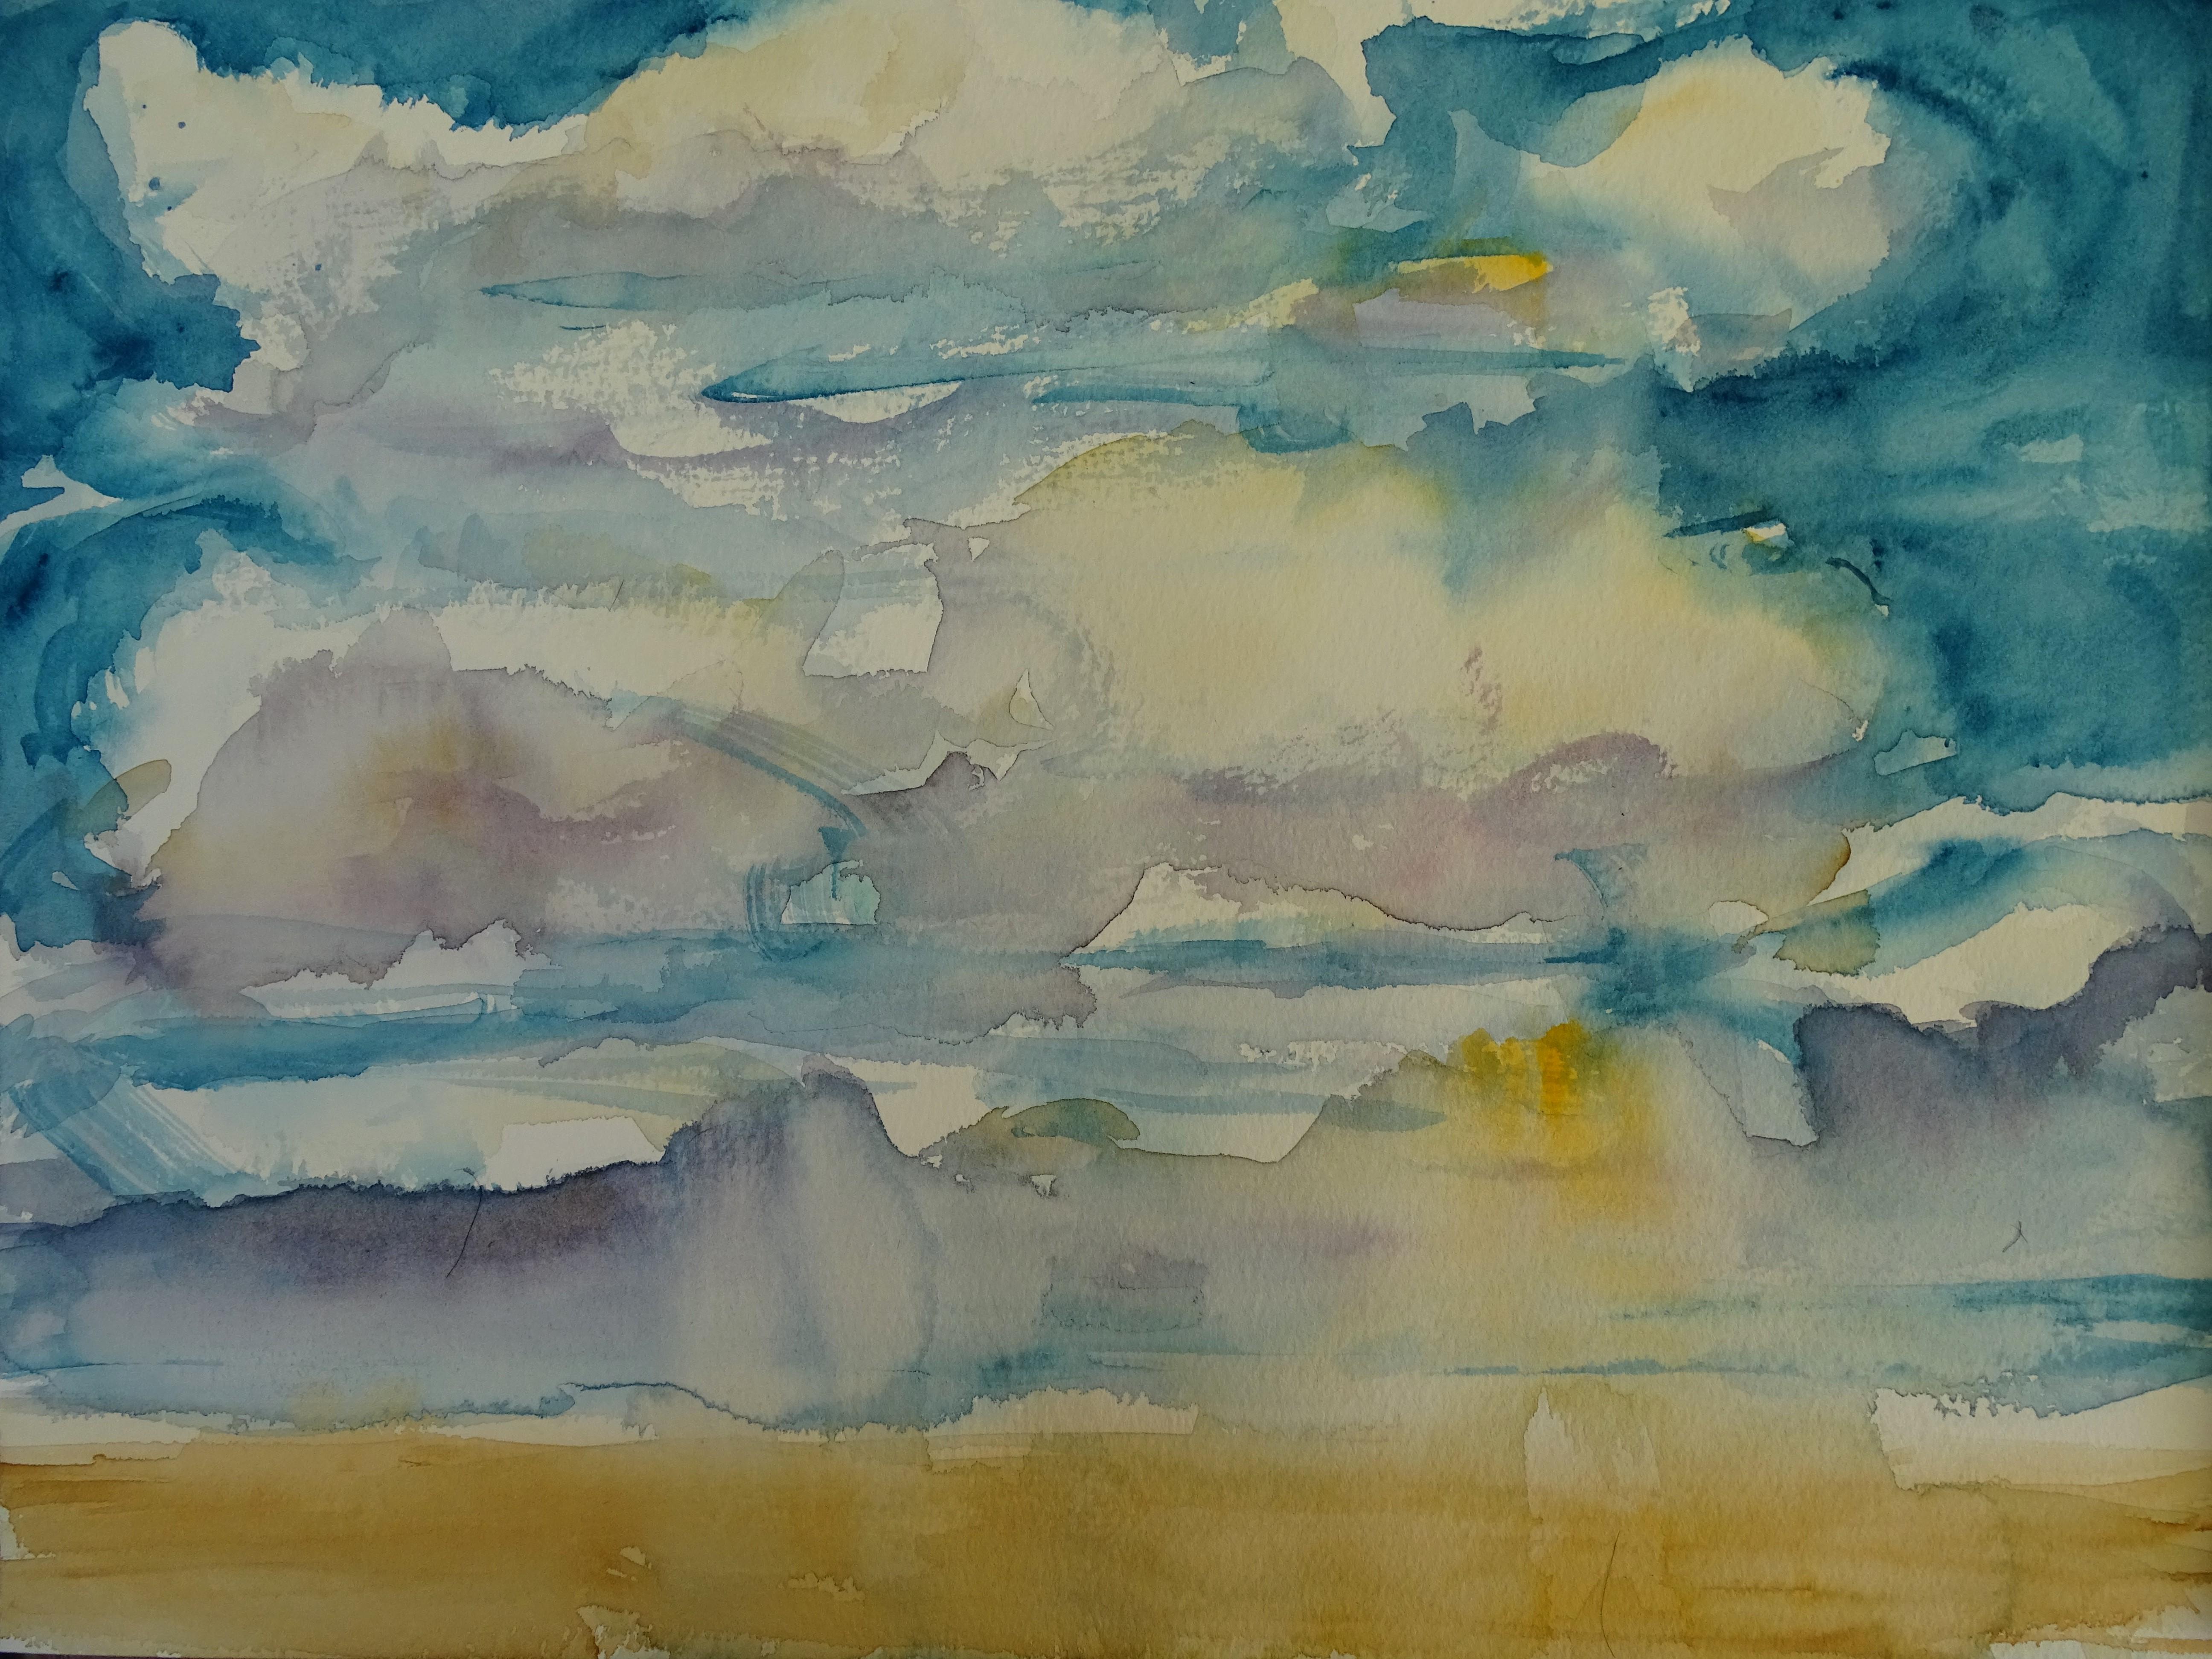 Himmel-Aquarell-Nadia-Baumgart-3